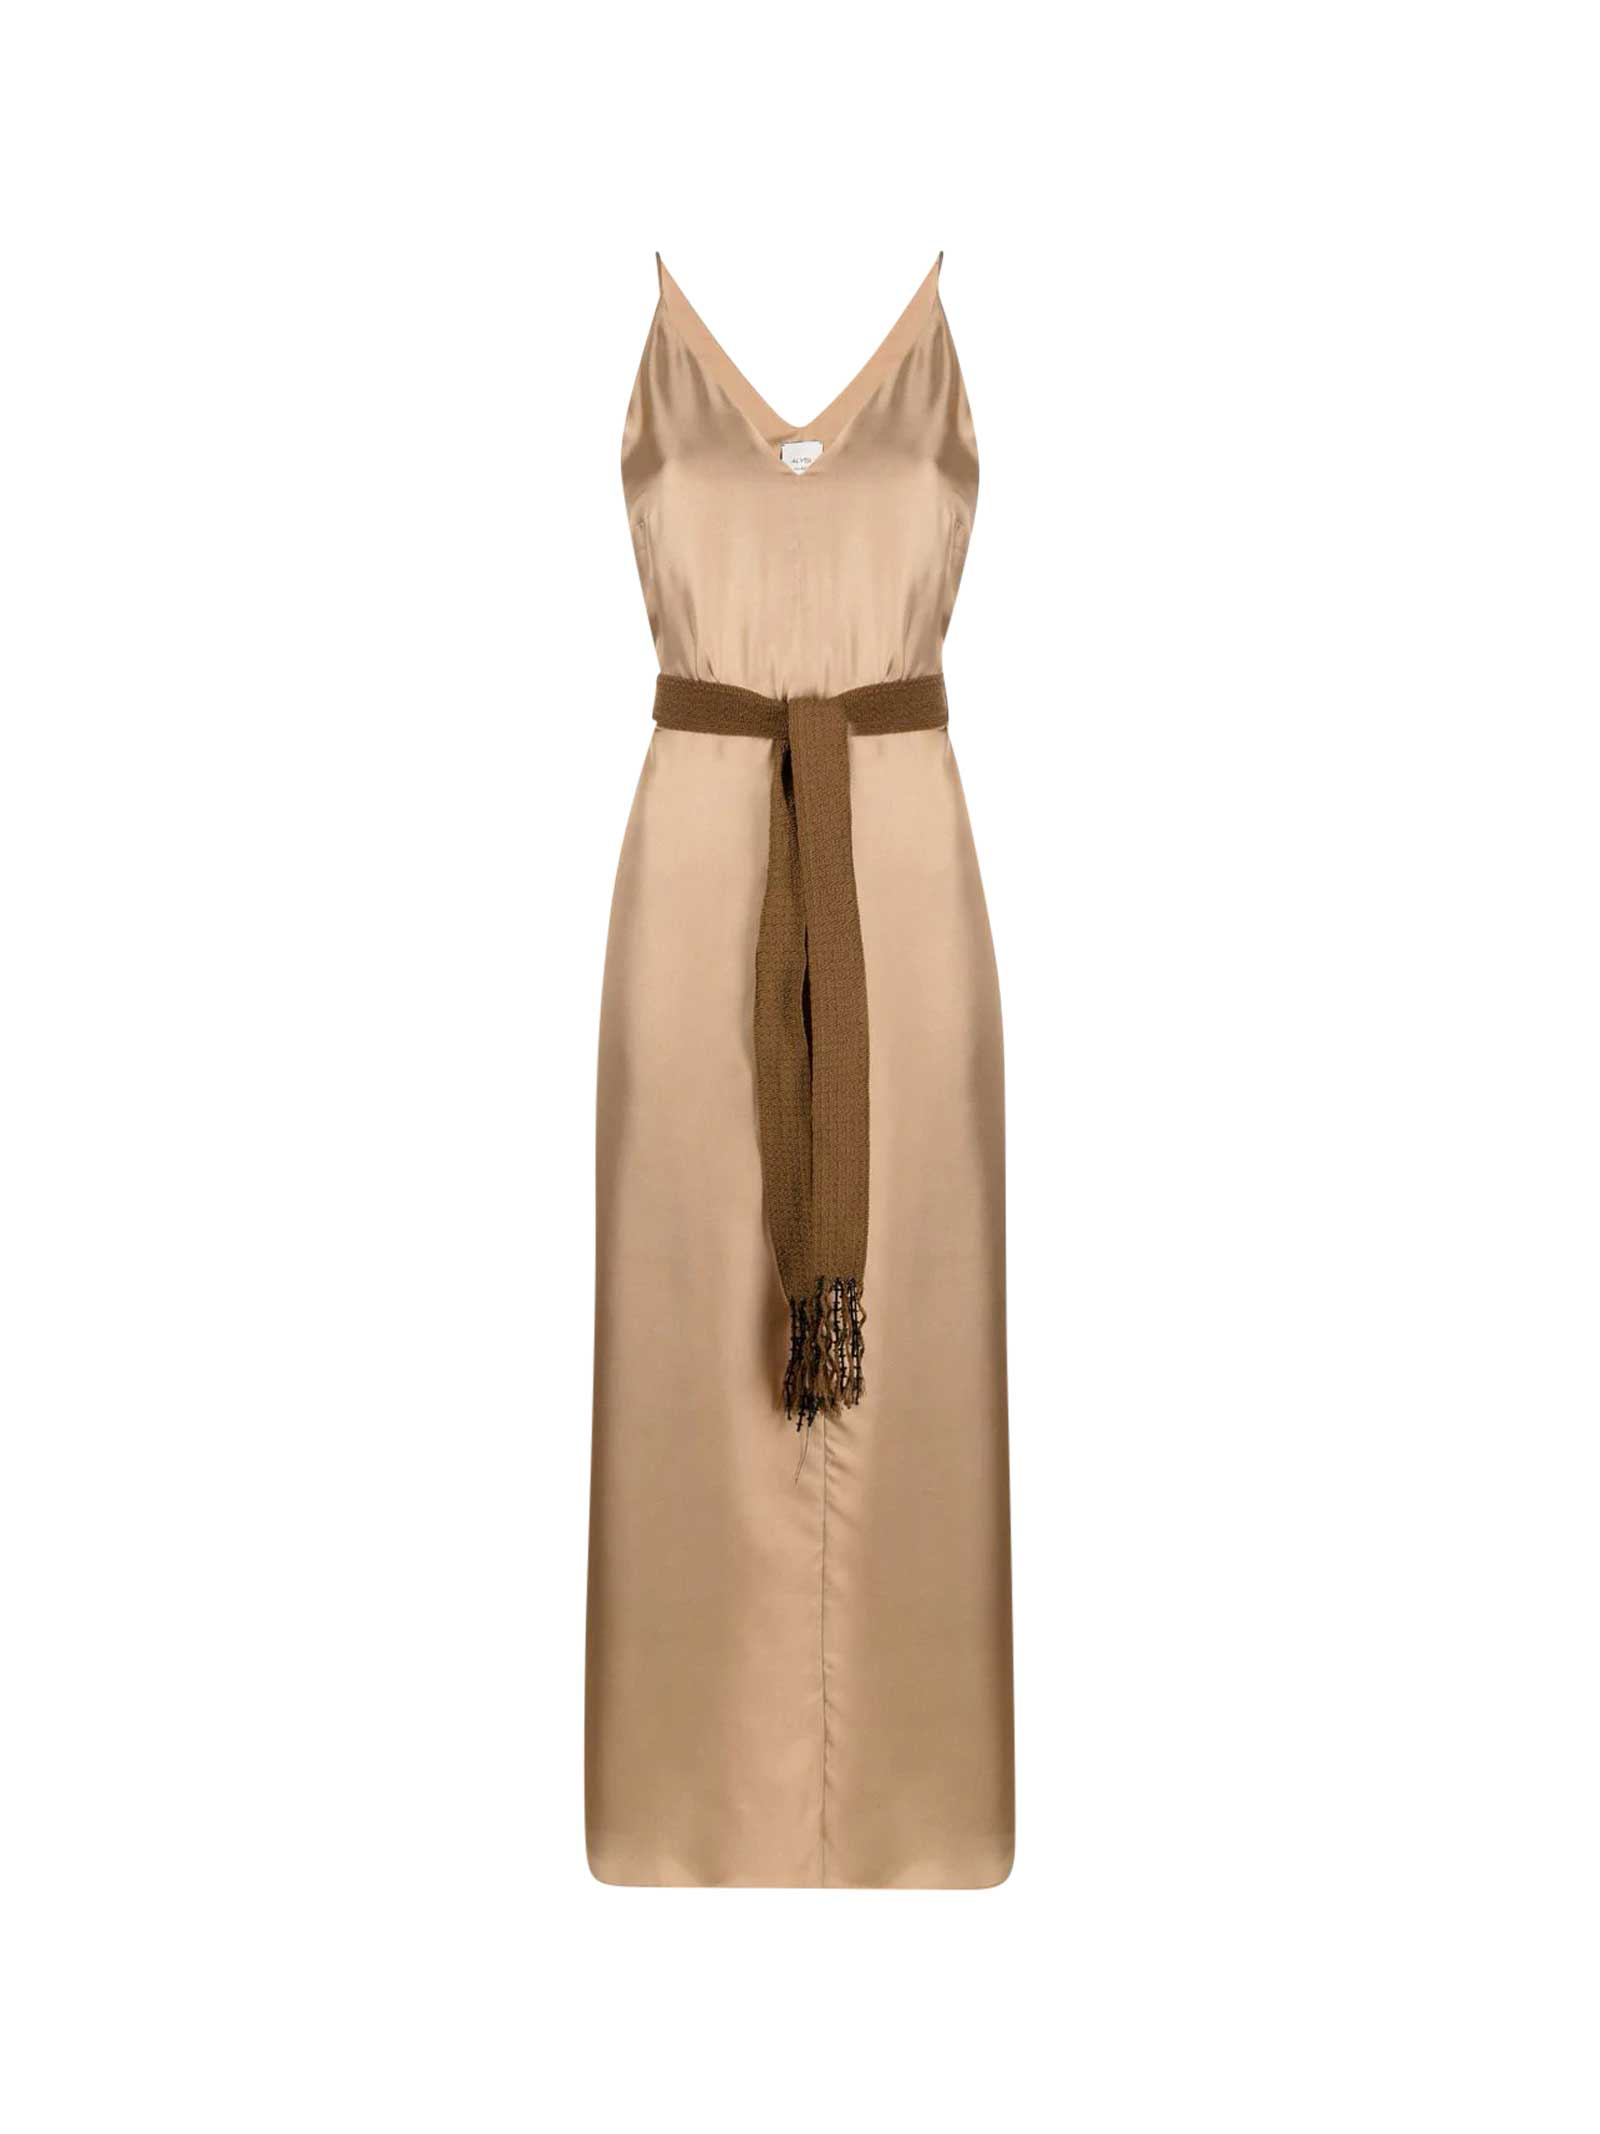 Alysi Dresses BELTED DRESS